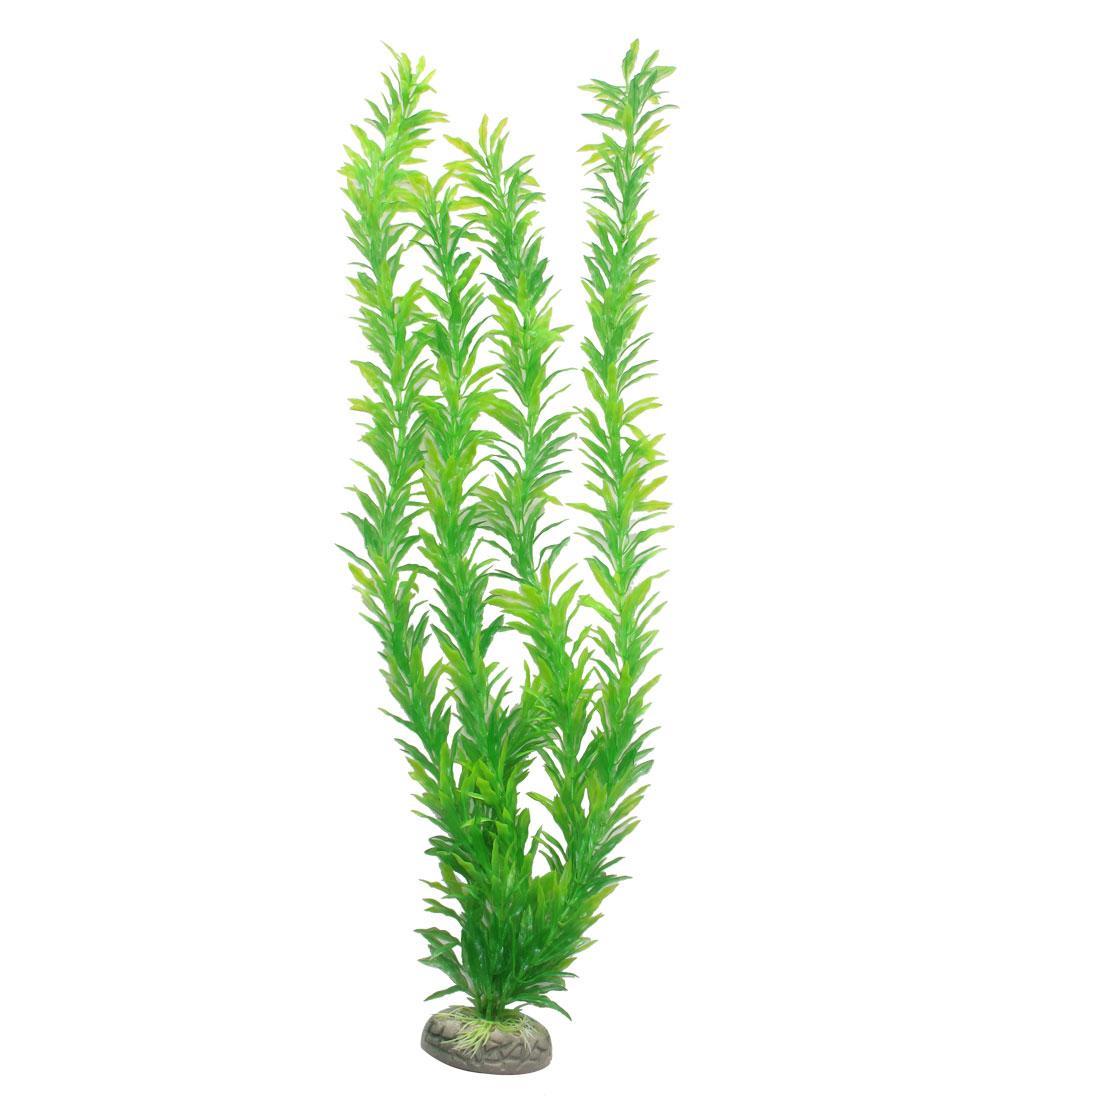 "18.1"" Height Green Manmade Aquarium Plastic Plant for Fish Tank"